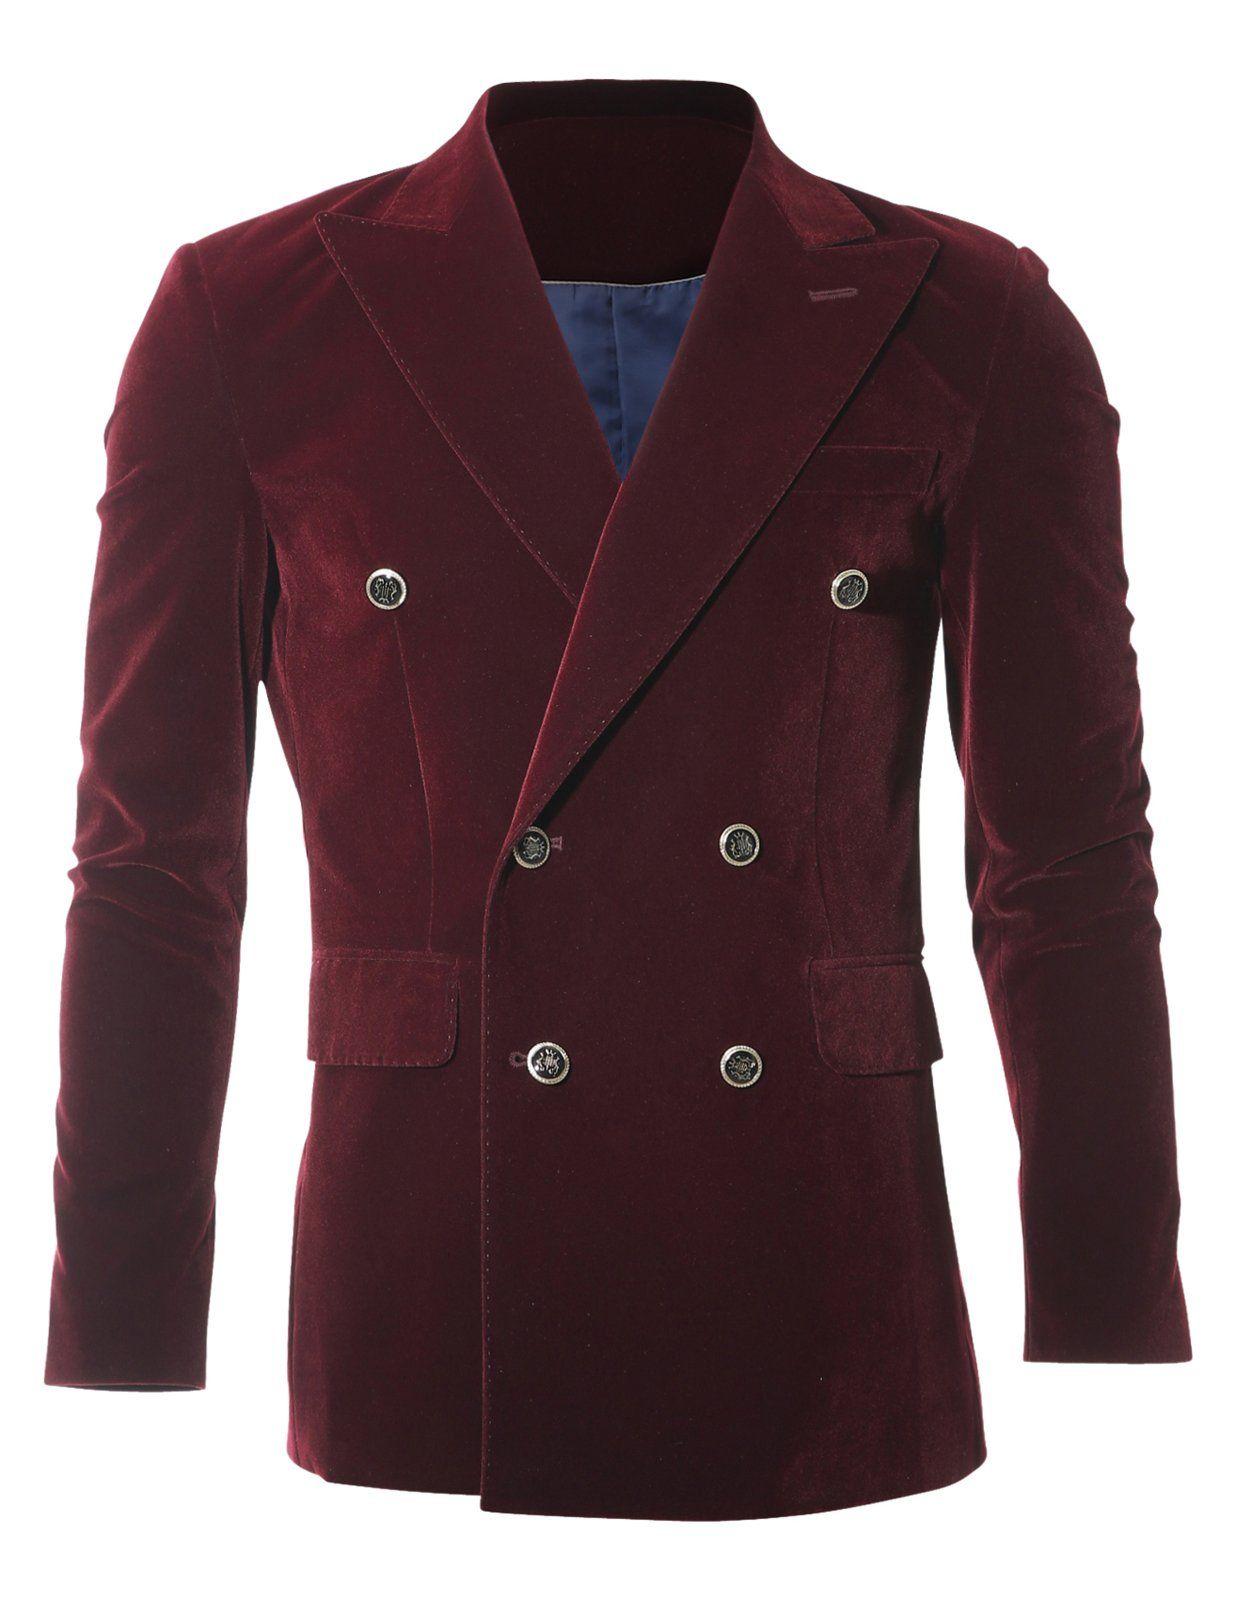 FLATSEVEN Mens Slim Fit Peaked Lapel Double Breasted Velvet Blazer Jacket (BJ488) Wine, XXL (US Large / 40~42)